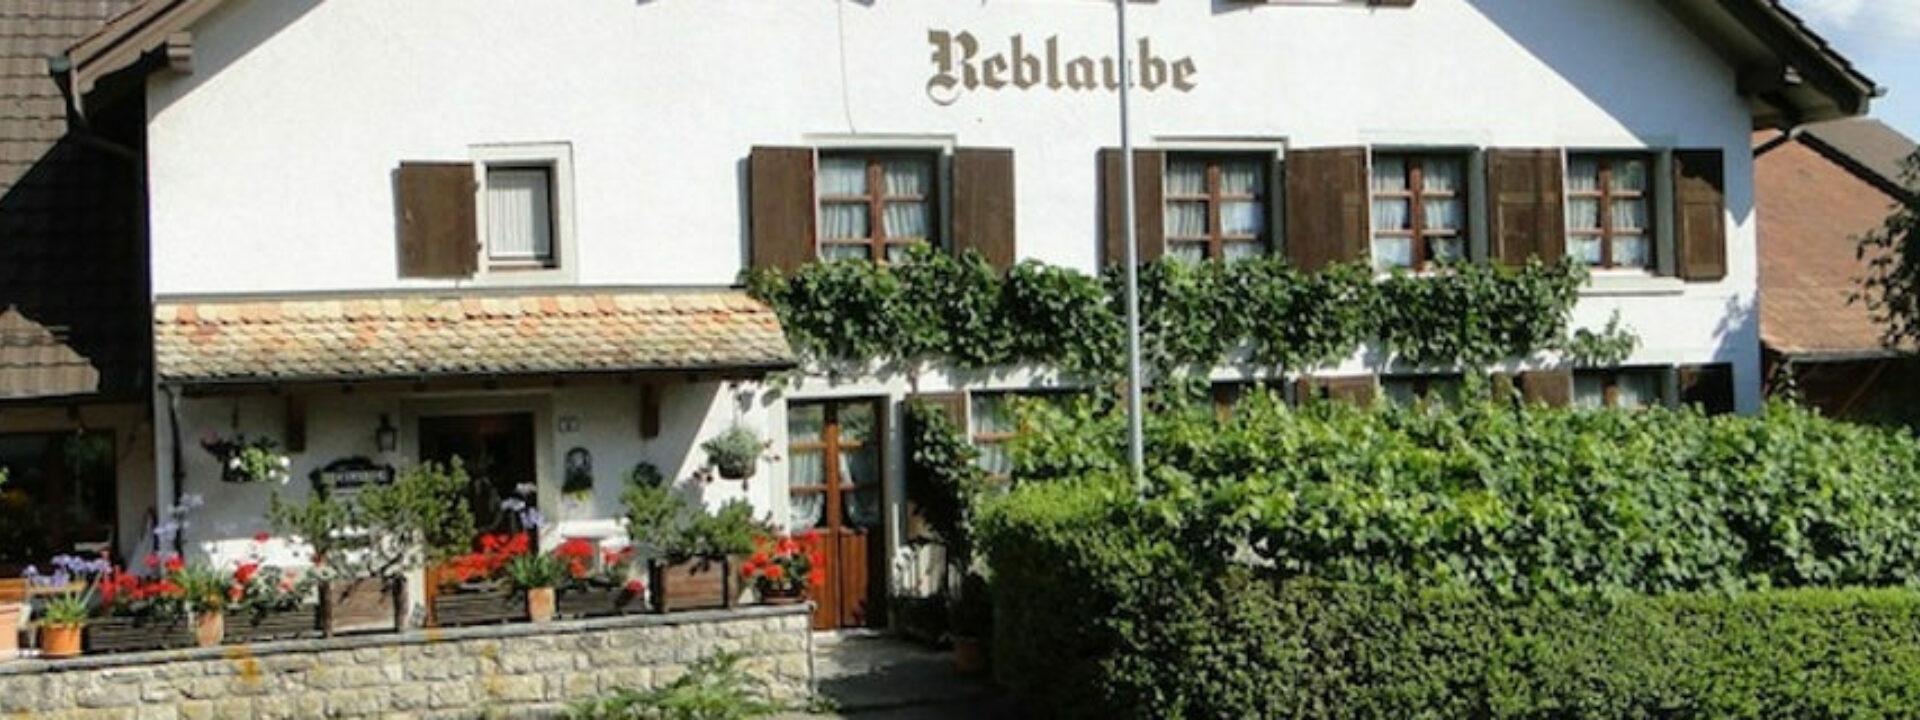 Restaurant Reblaube